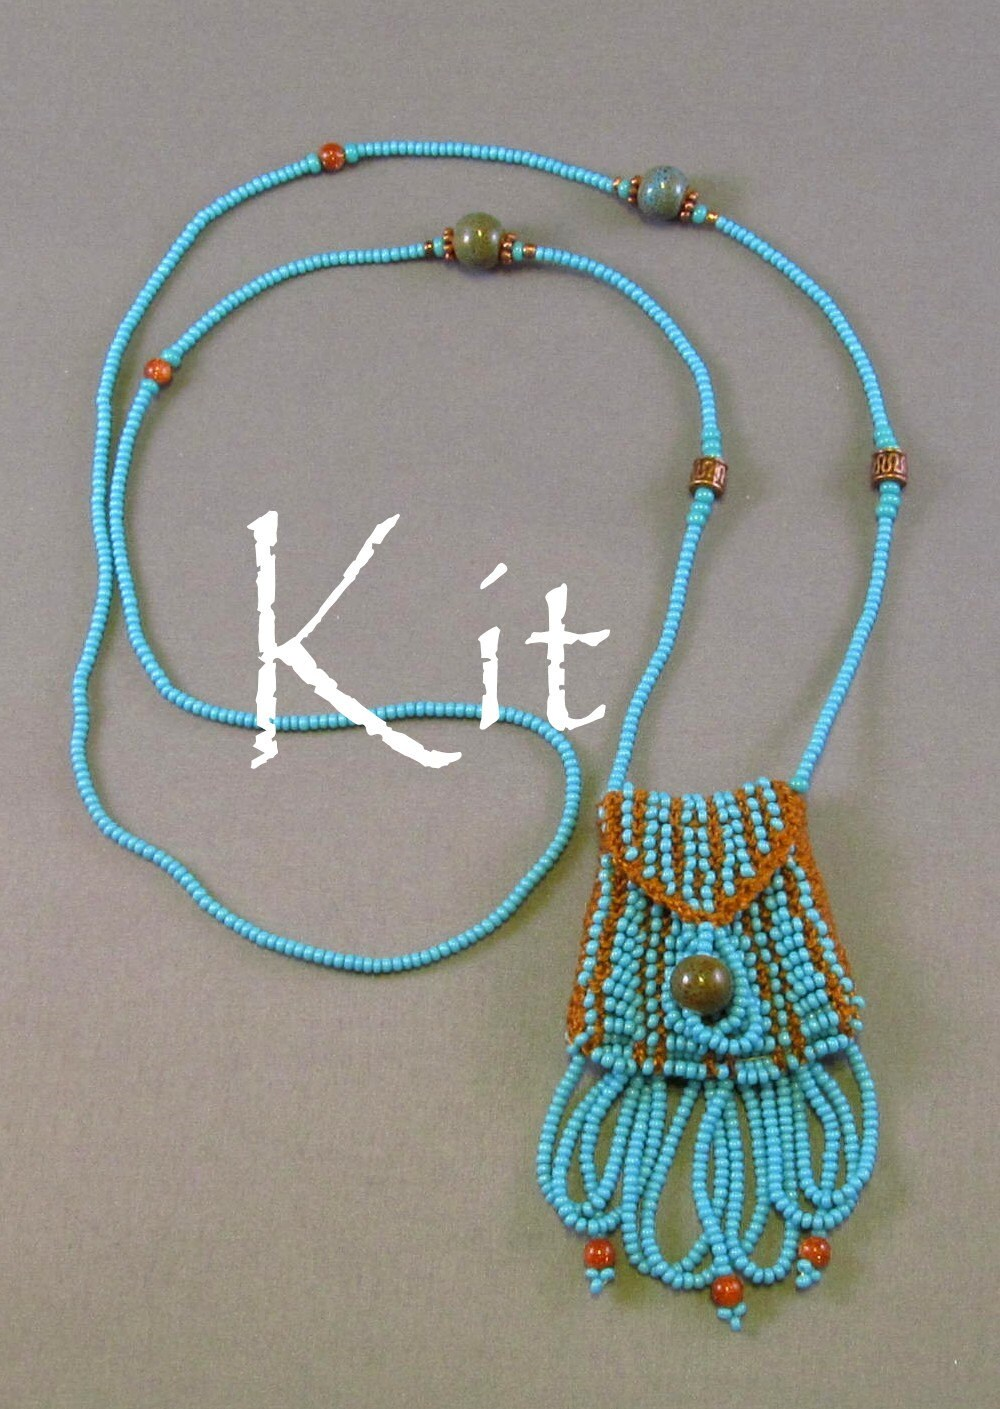 Knitting Jewelry Kits : Brigitte kit a beaded knit necklace purse turquoise